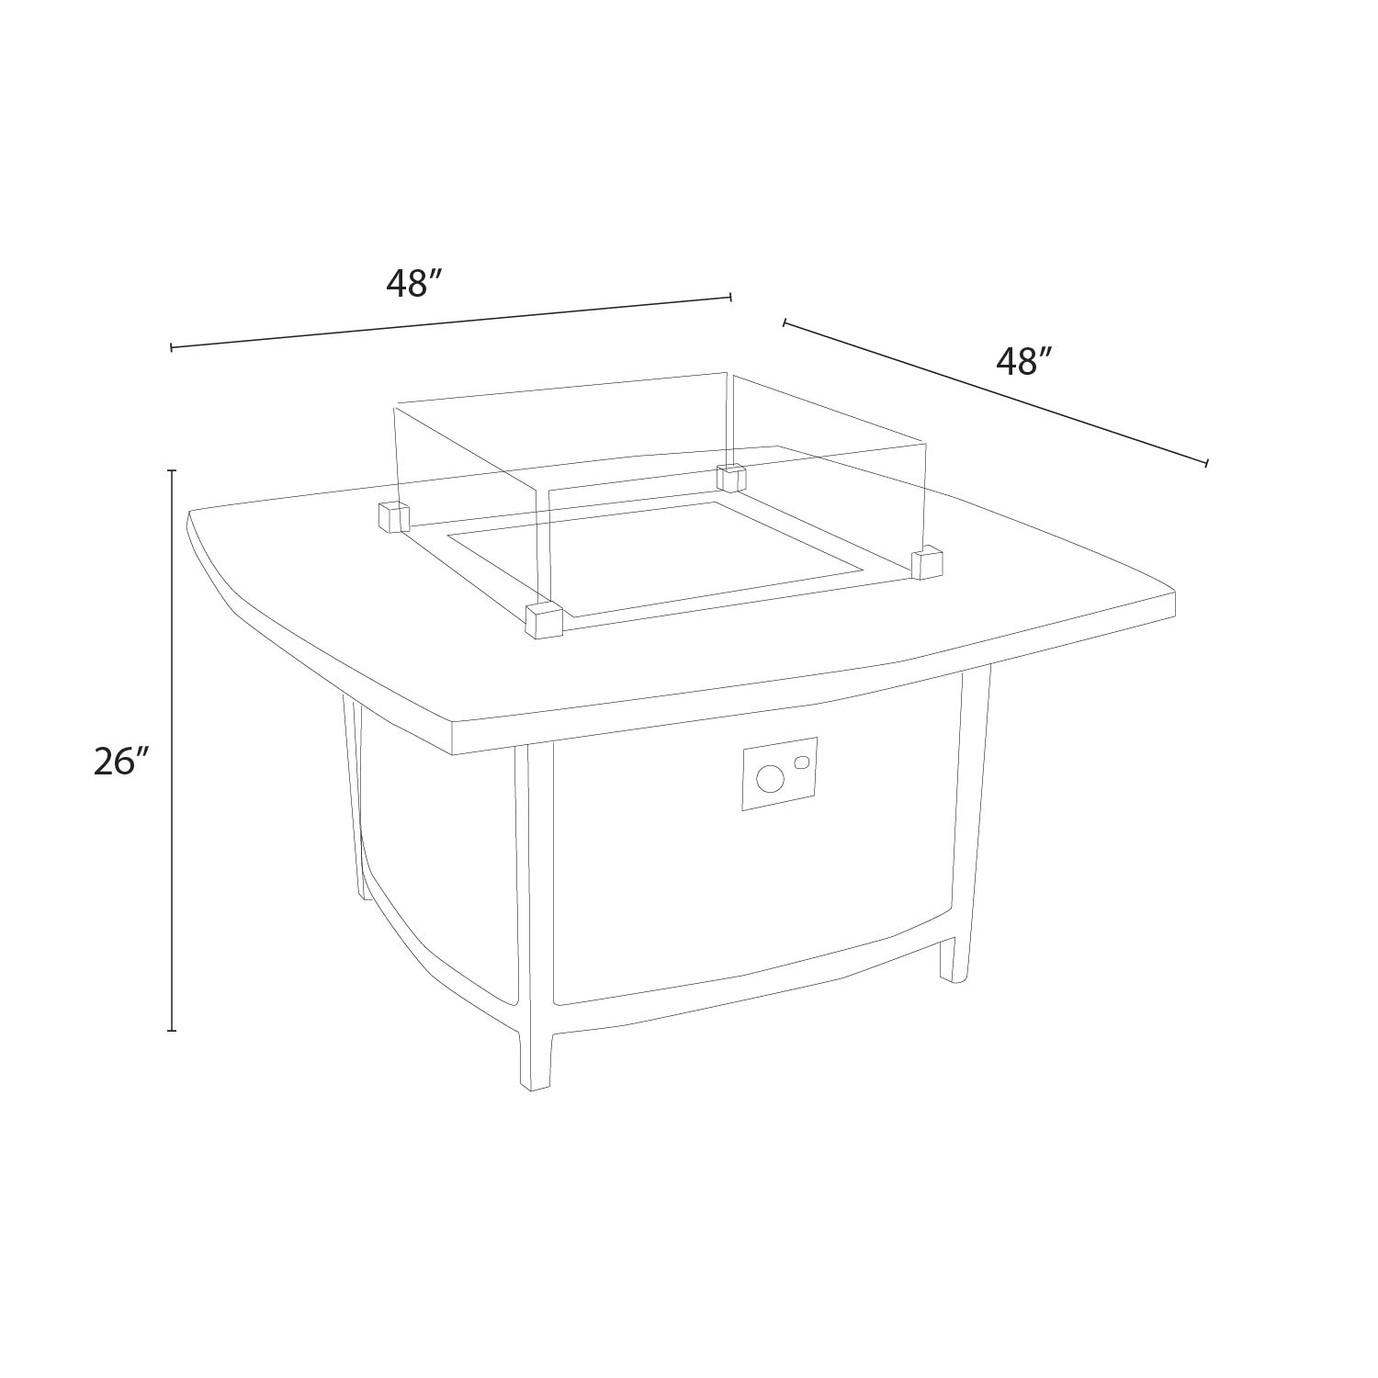 Vistano™ 48in Stone Top Fire Table